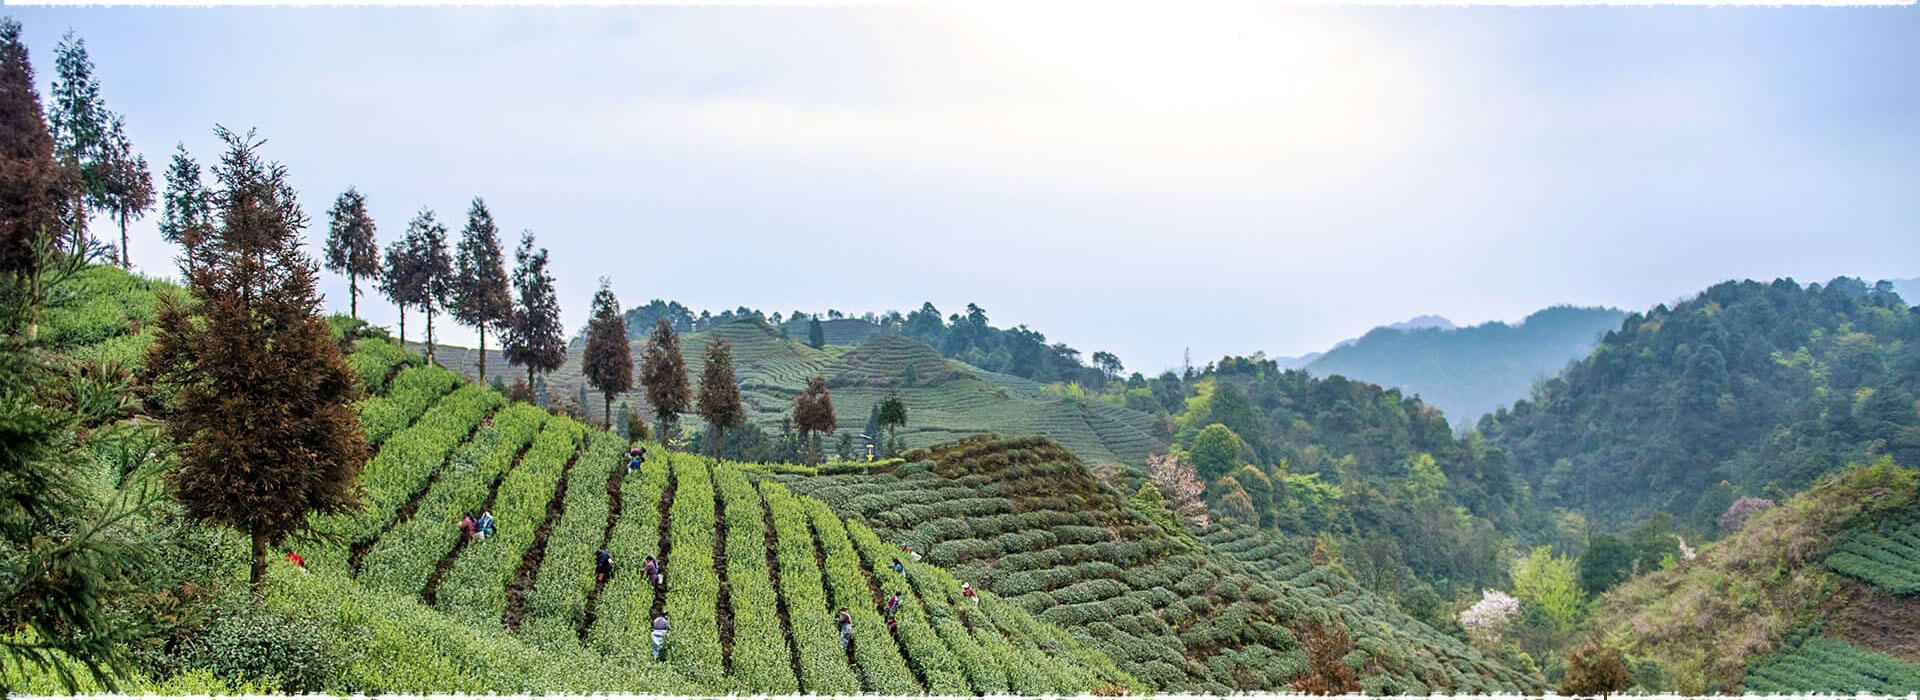 Nanguang Tea Garden